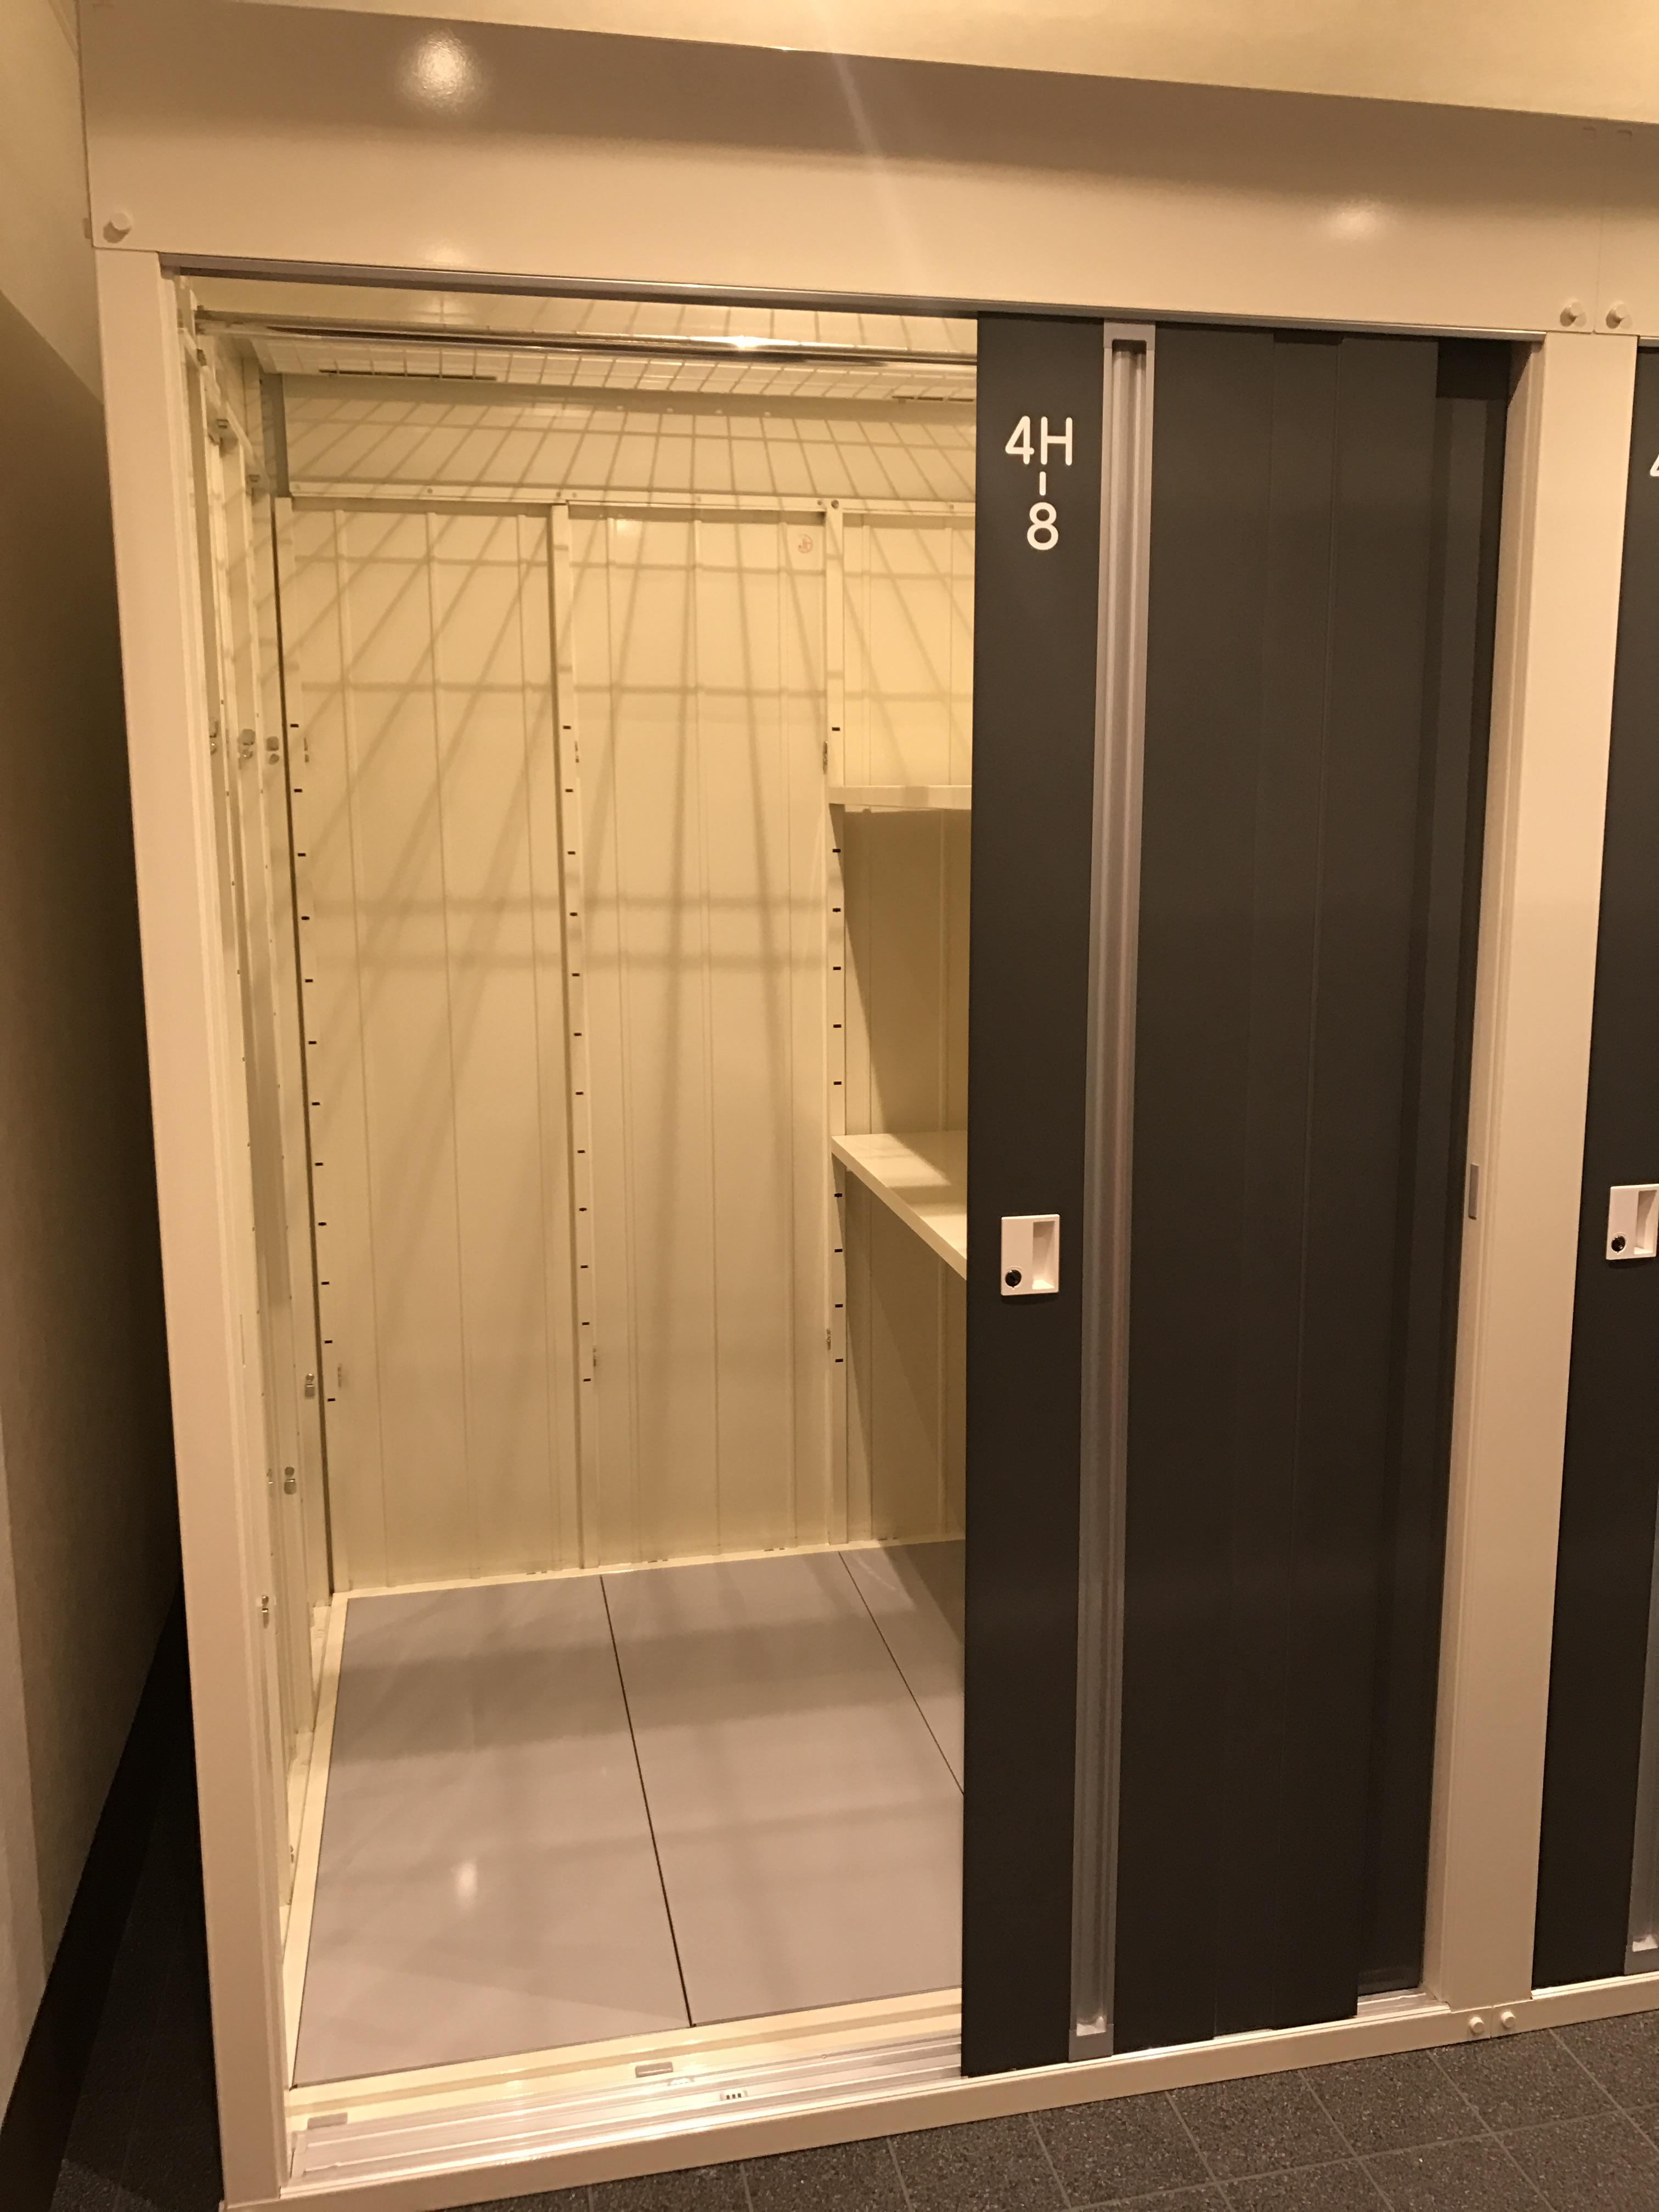 INABA96 本庄見福店 TFタイプ 1.9 m2約1.1畳1.37 × 1.37 × 2.30